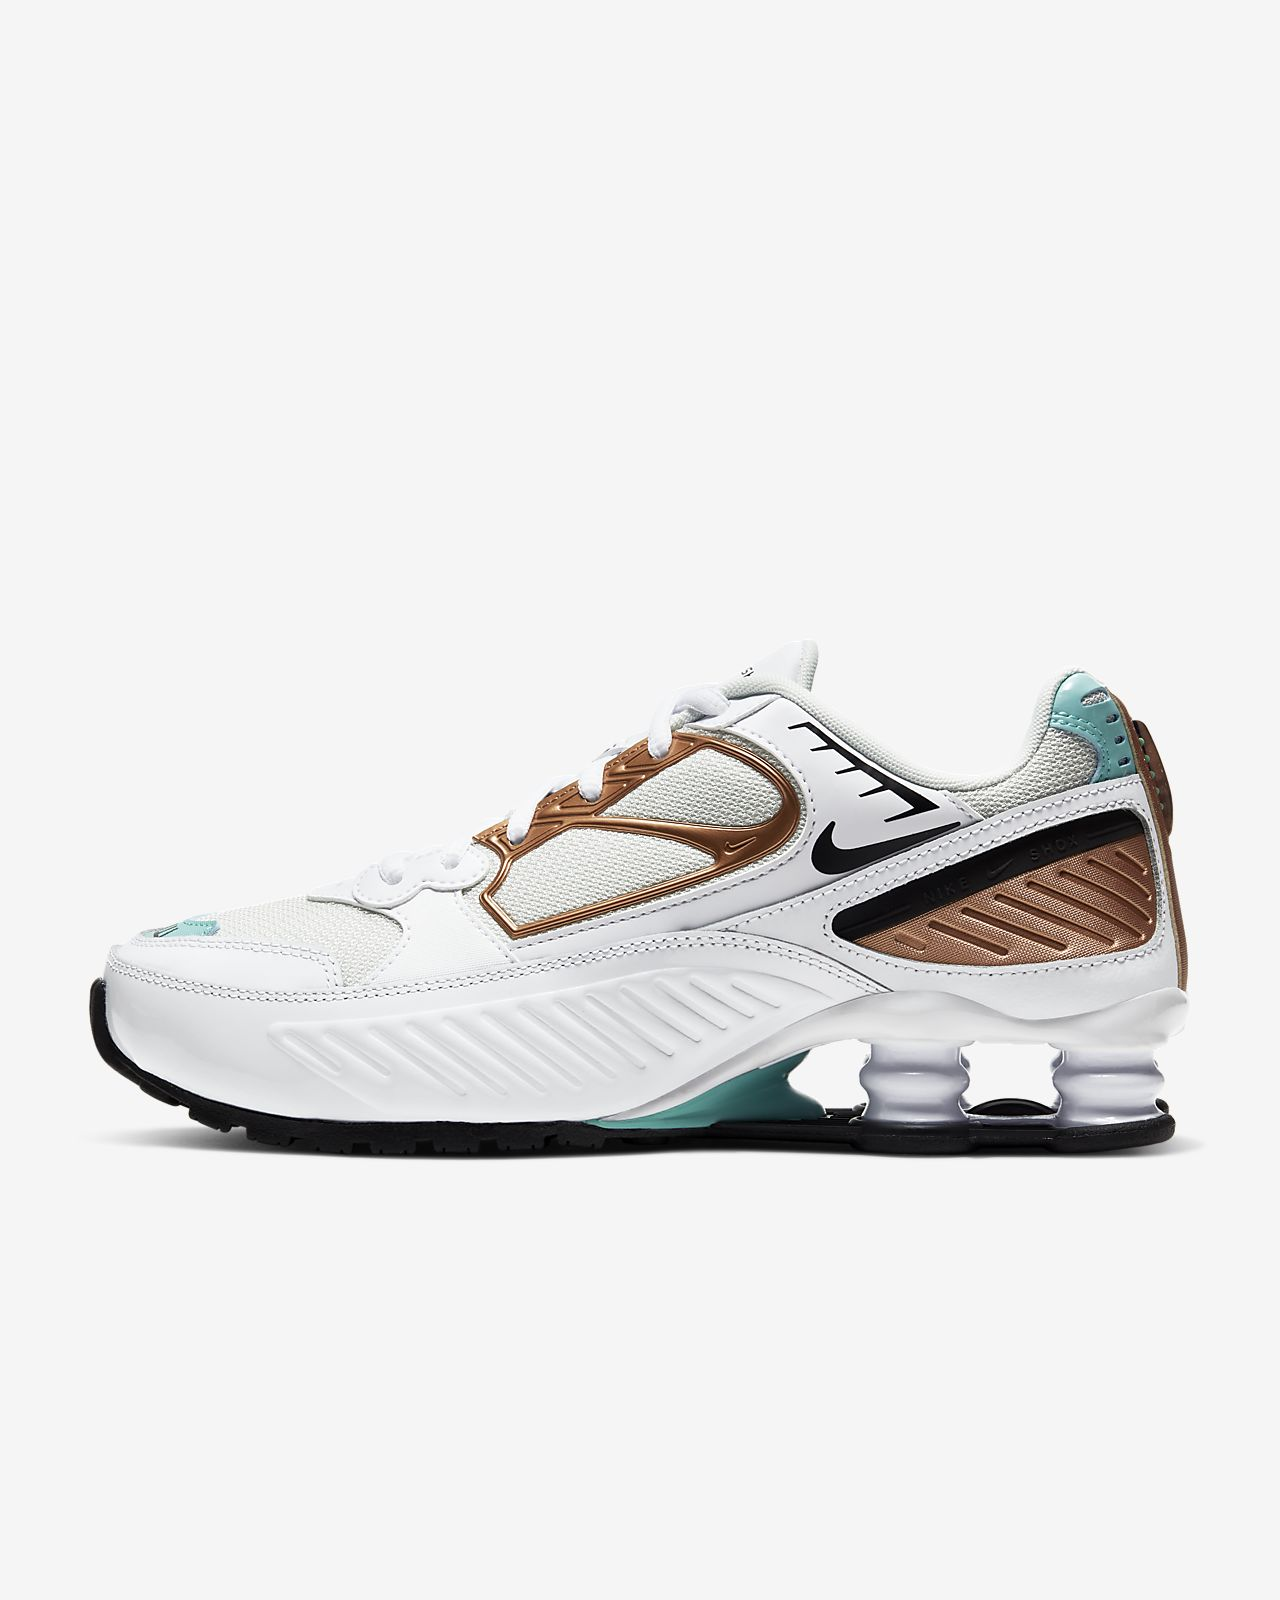 Sko Nike Shox Enigma 9000 för kvinnor